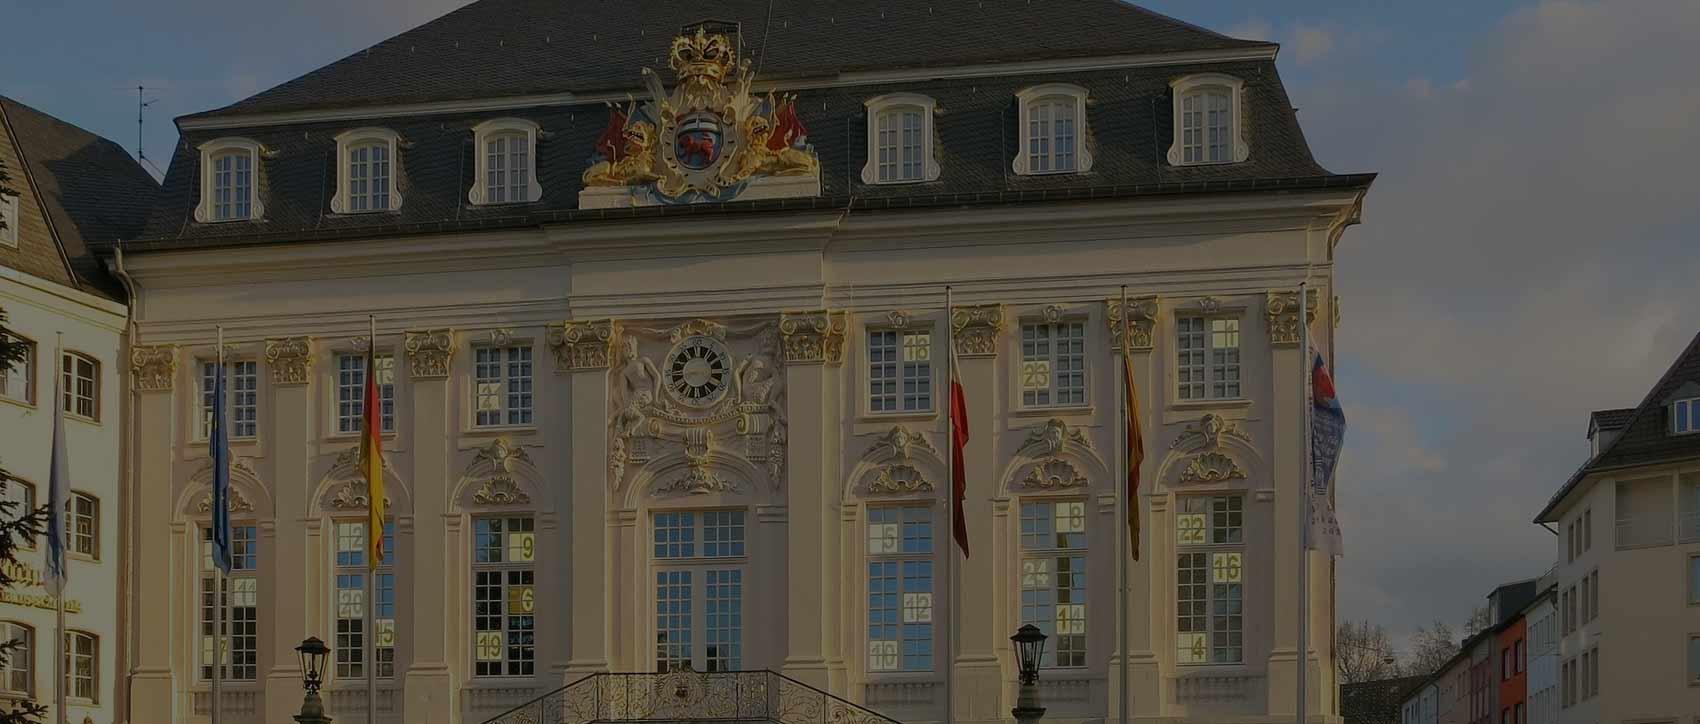 Autoankauf in Bonn